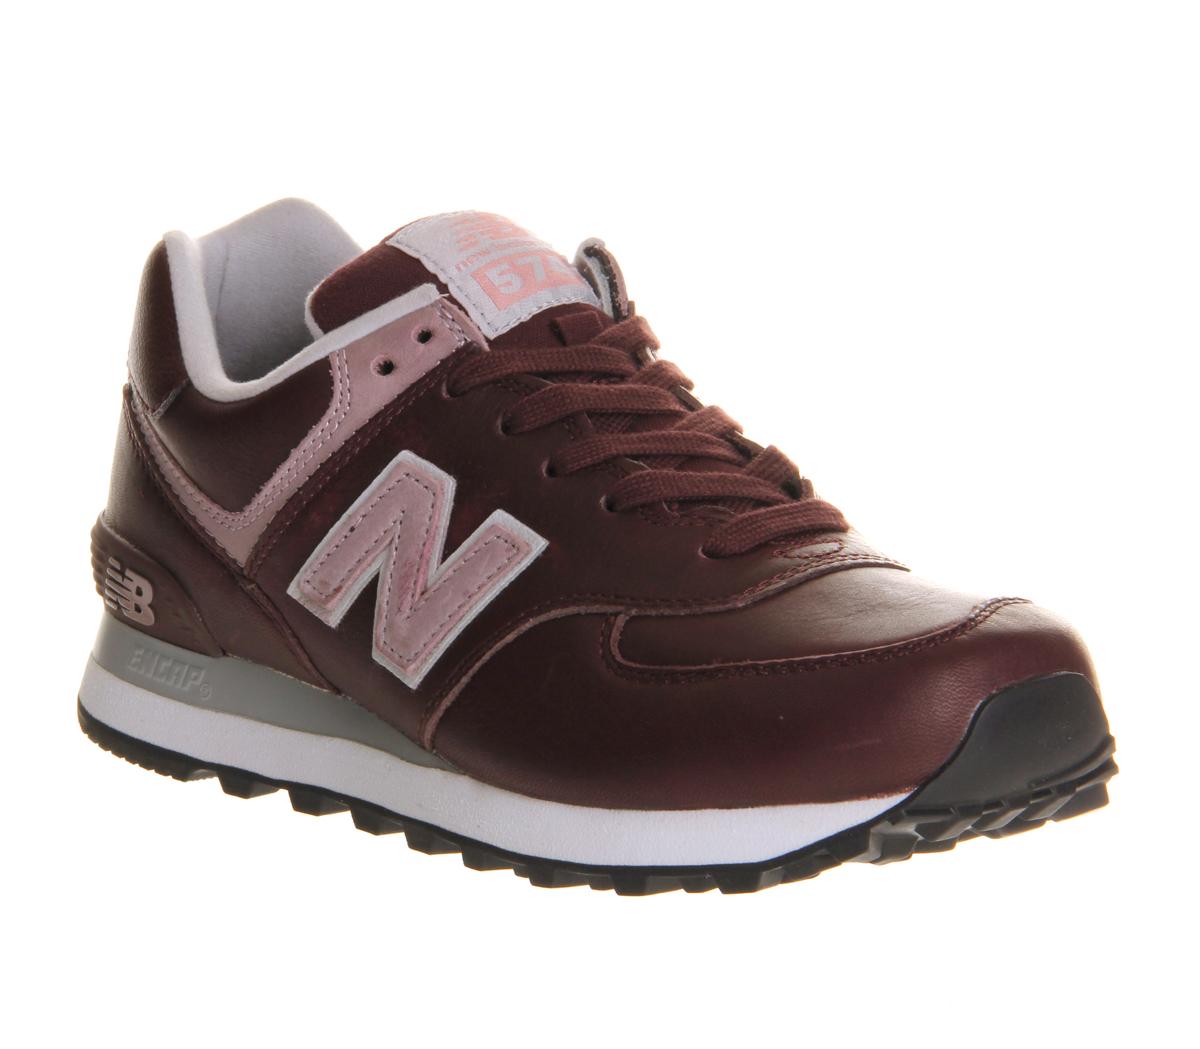 new balance wl574 burgundy trainers shoes ebay. Black Bedroom Furniture Sets. Home Design Ideas